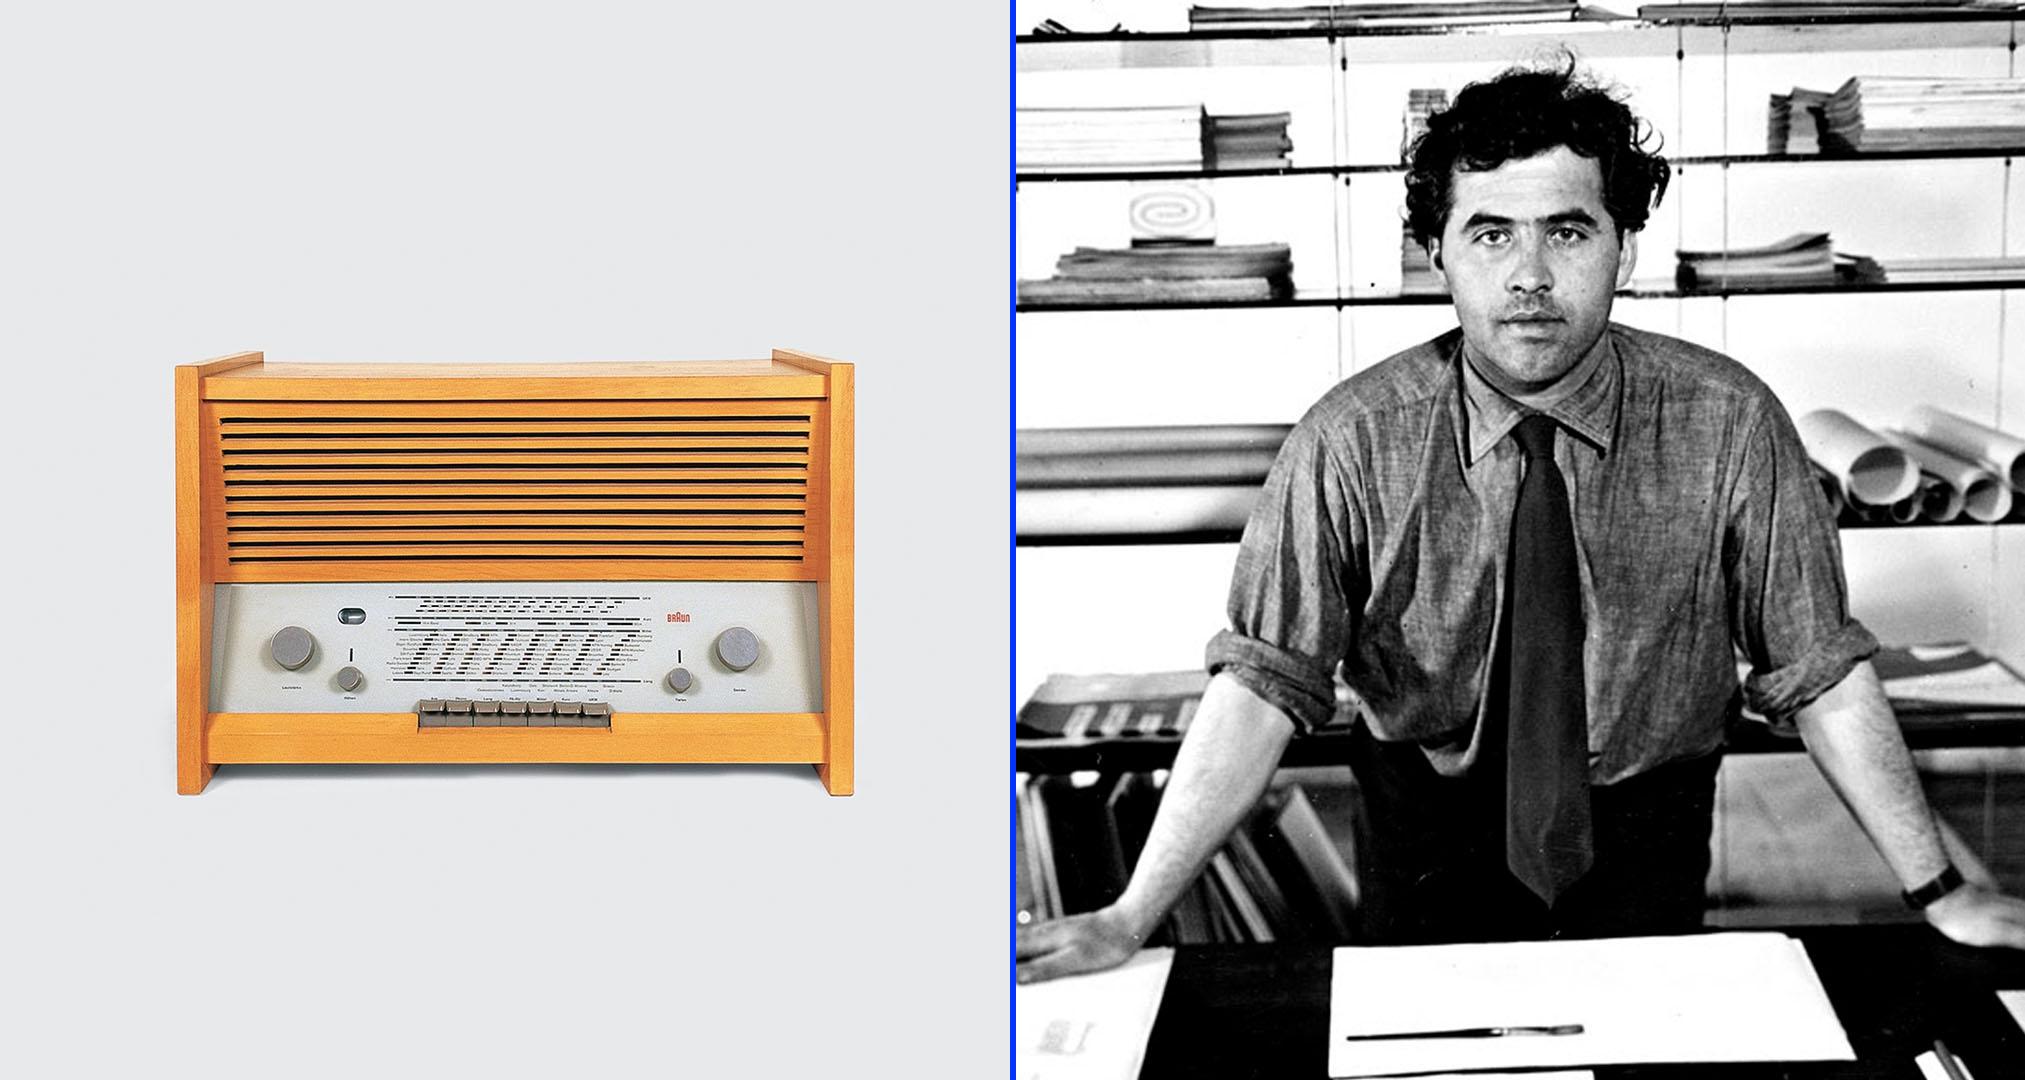 Radio G 11 diseñada por Hans Gugelot - Otl Aicher